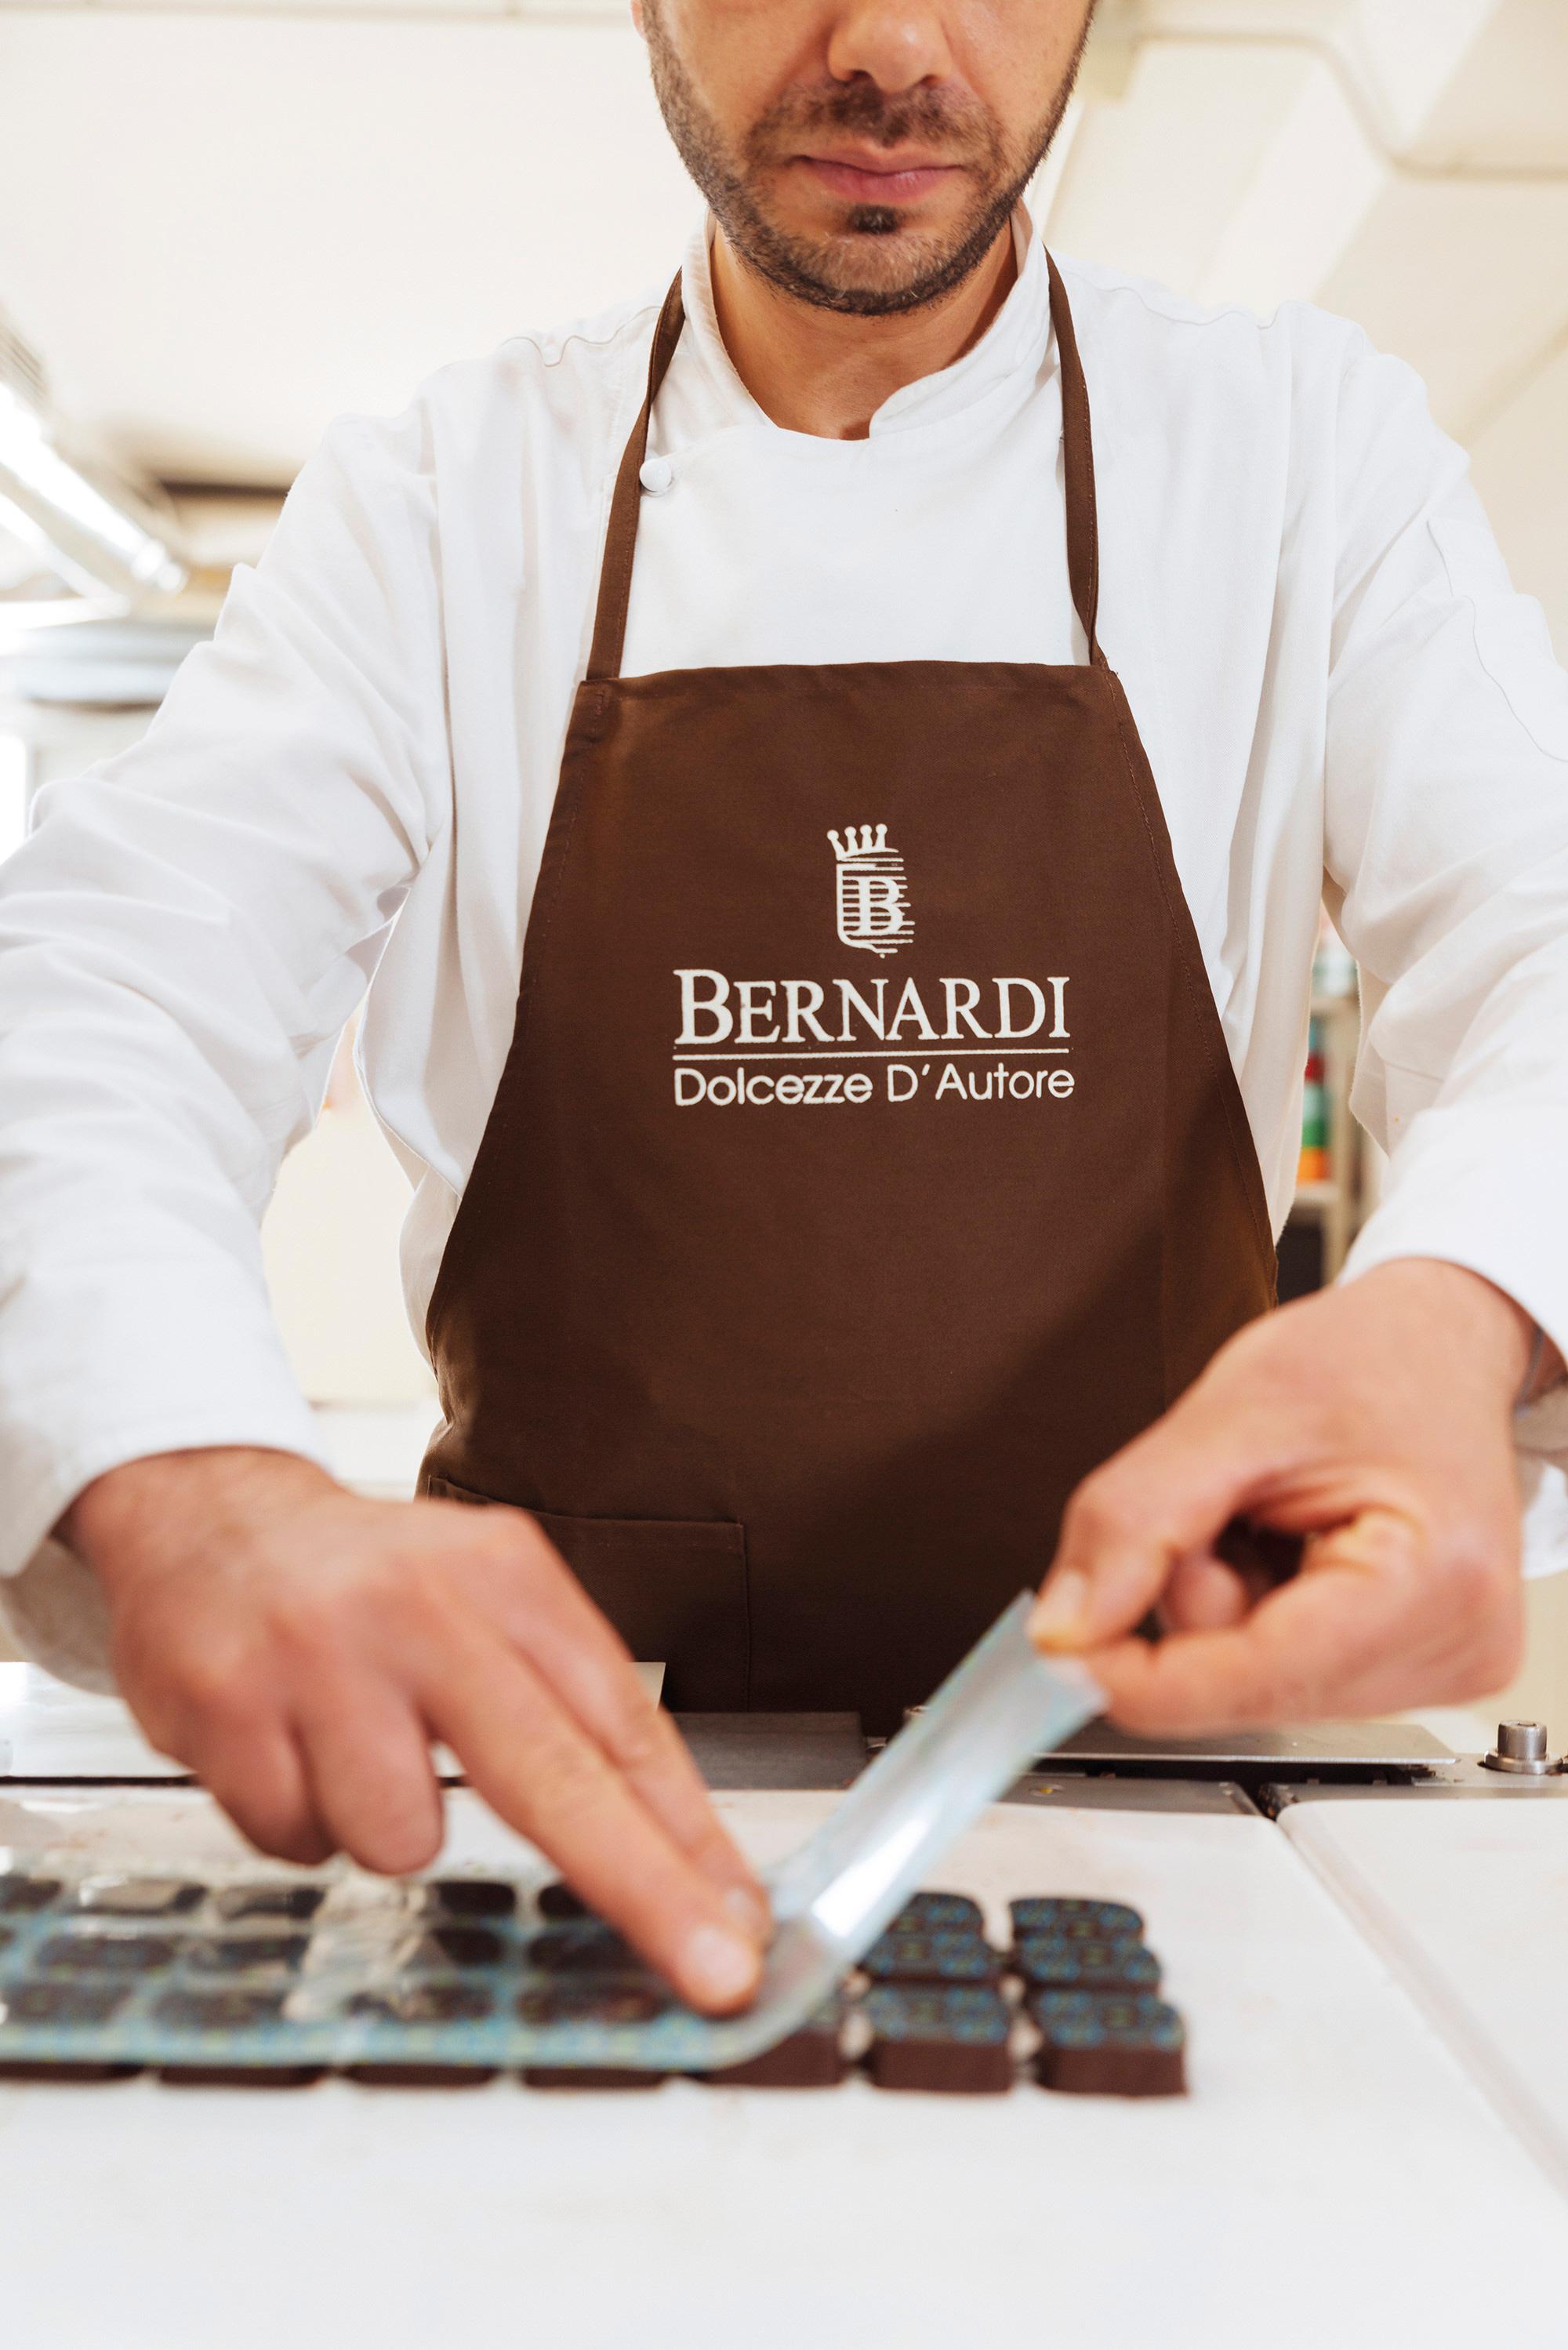 Bernardi cioccolato